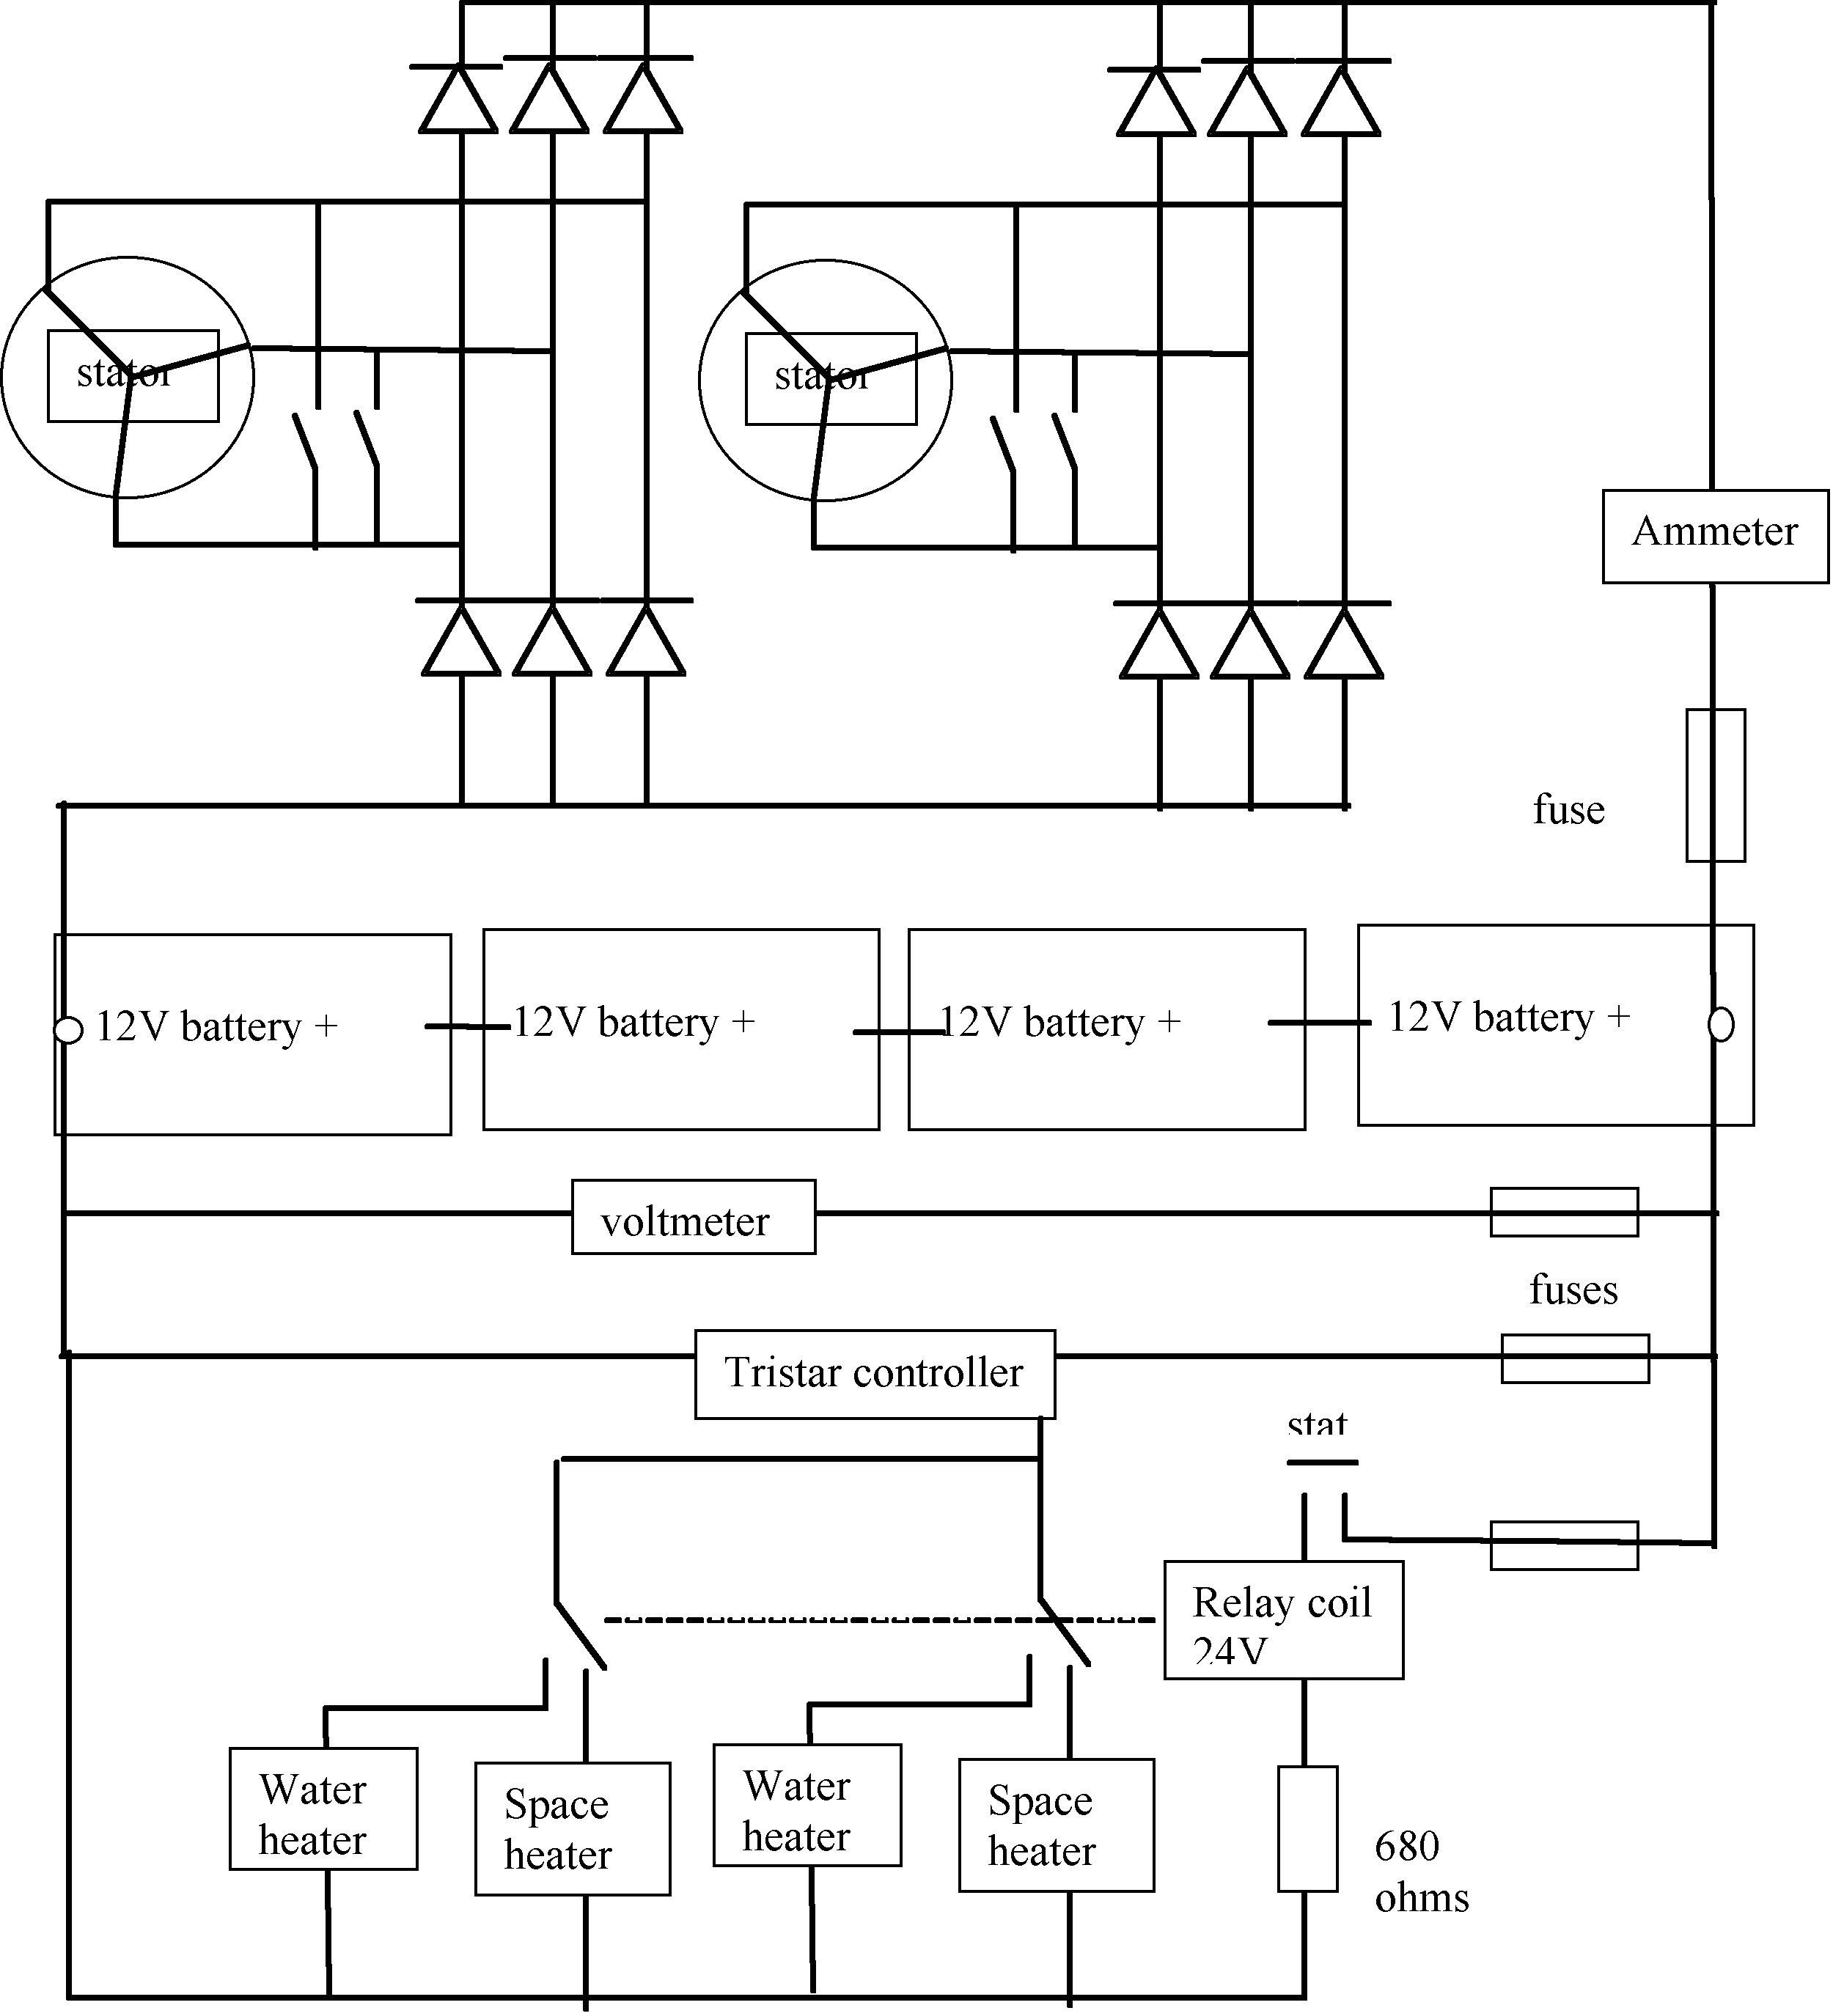 Diagram Rv Hot Water Heater Switch Wiring Diagram Full Version Hd Quality Wiring Diagram Diagramduck Digitalight It